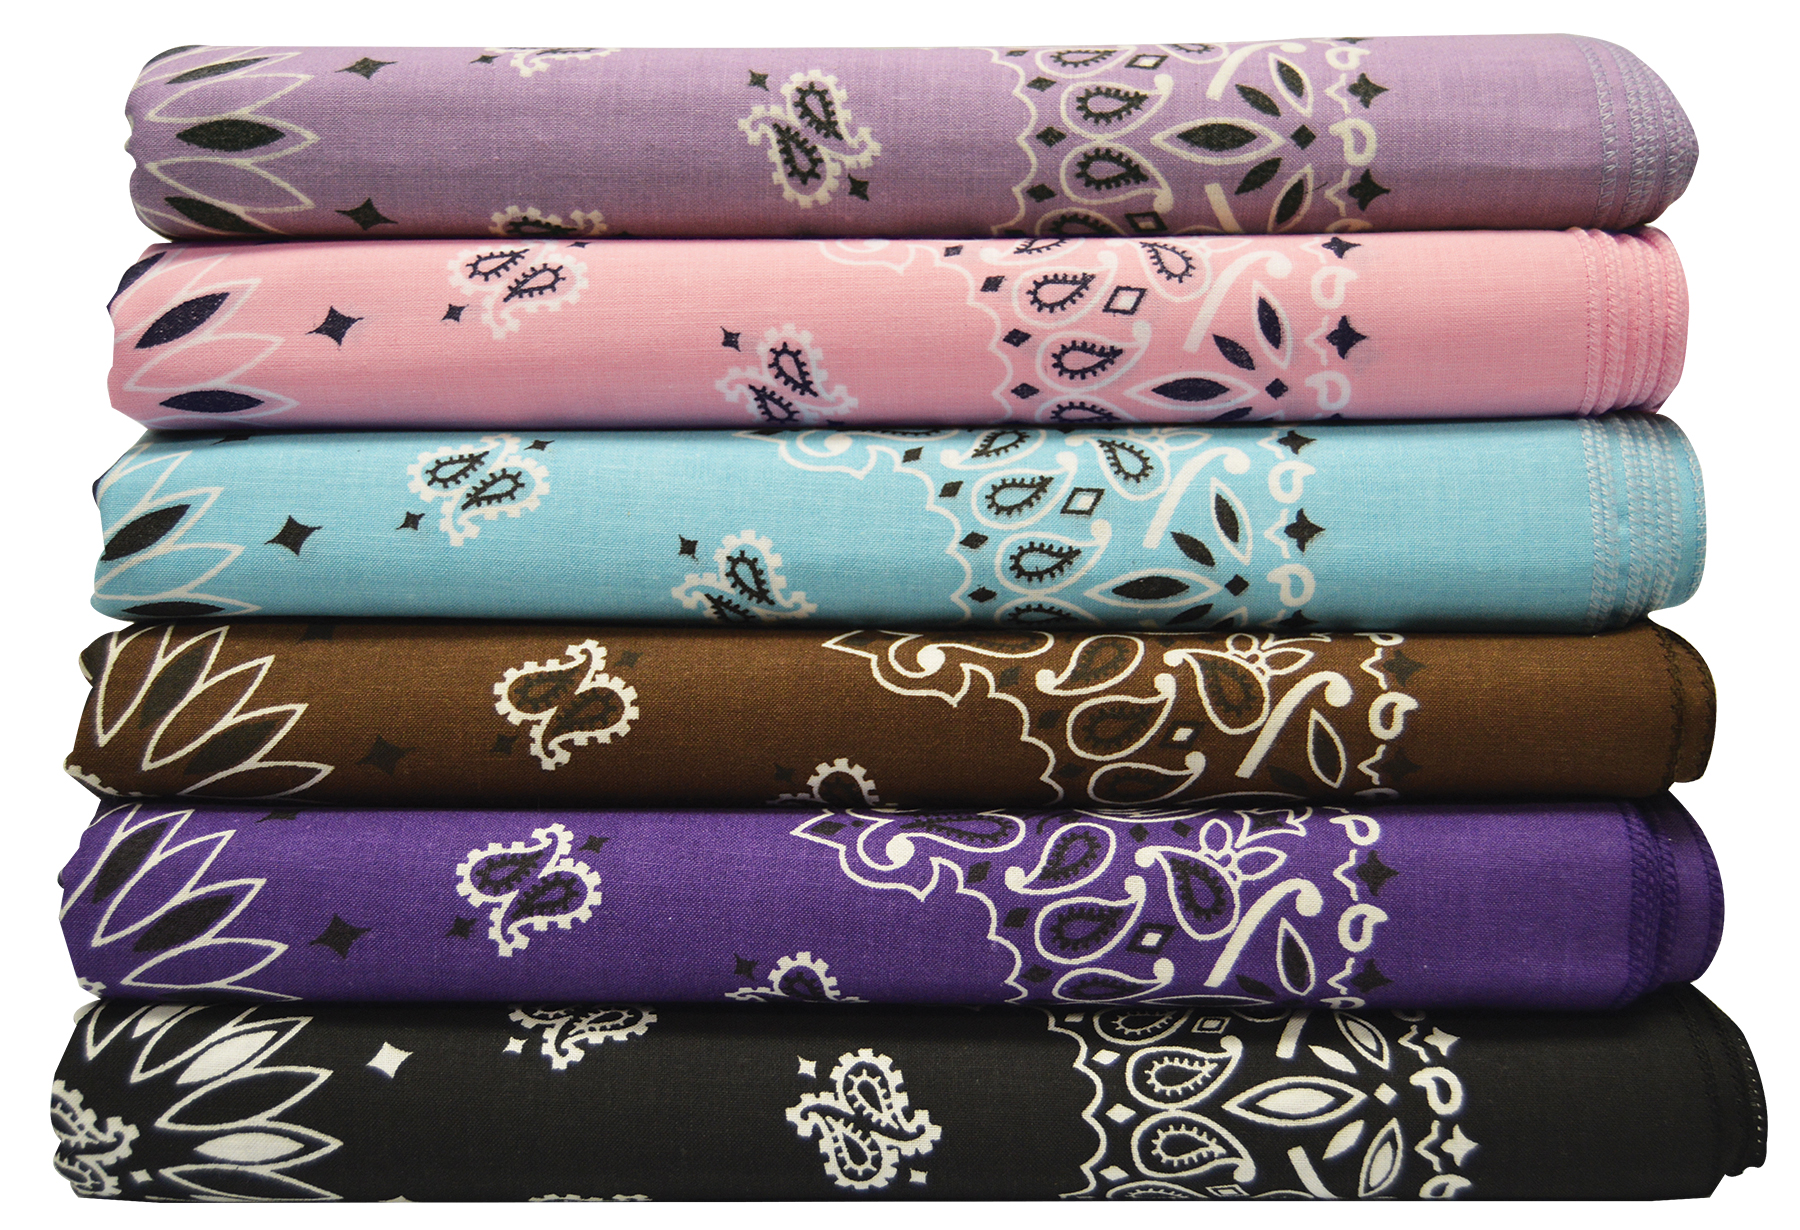 dark and light assortment of bandannas